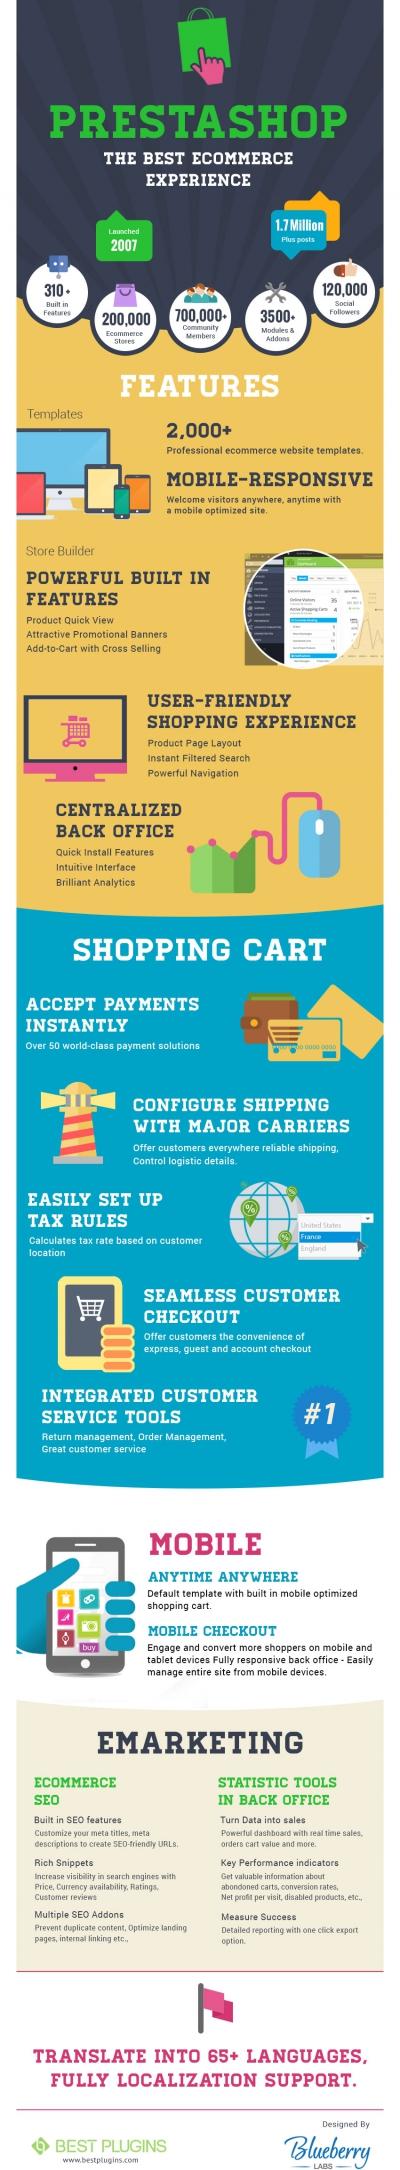 prestashop-cms-infographic